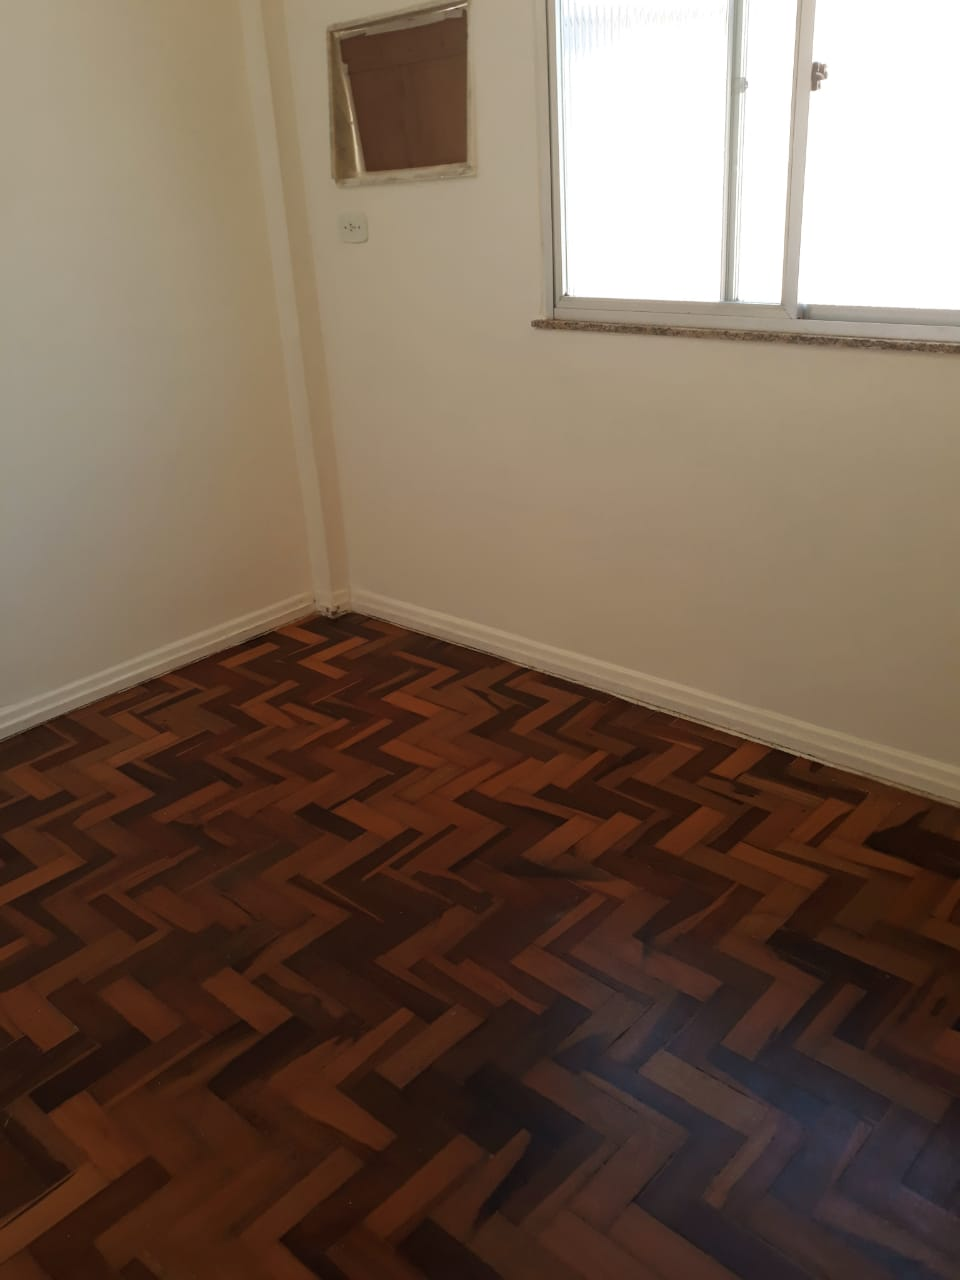 Ótimo apartamento vazio – Cód:P419